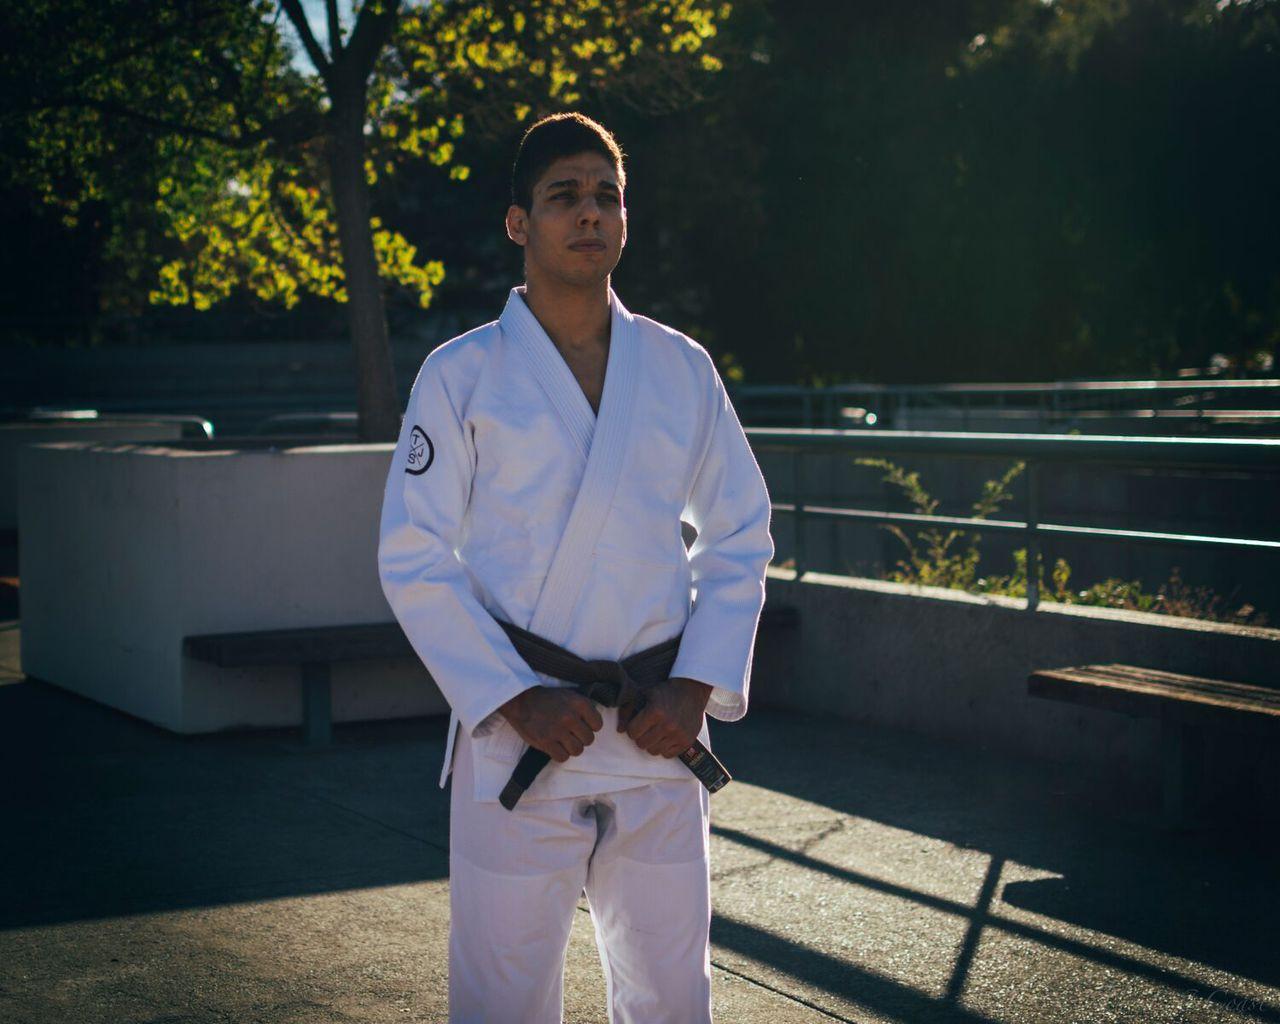 Pedro Silva The Jiu Jitsu Shop Minimalist Kimono Photoshoot.  Available at www.thejiujitsushop.com Front of the Gi  TJJS White Minimalist Kimono